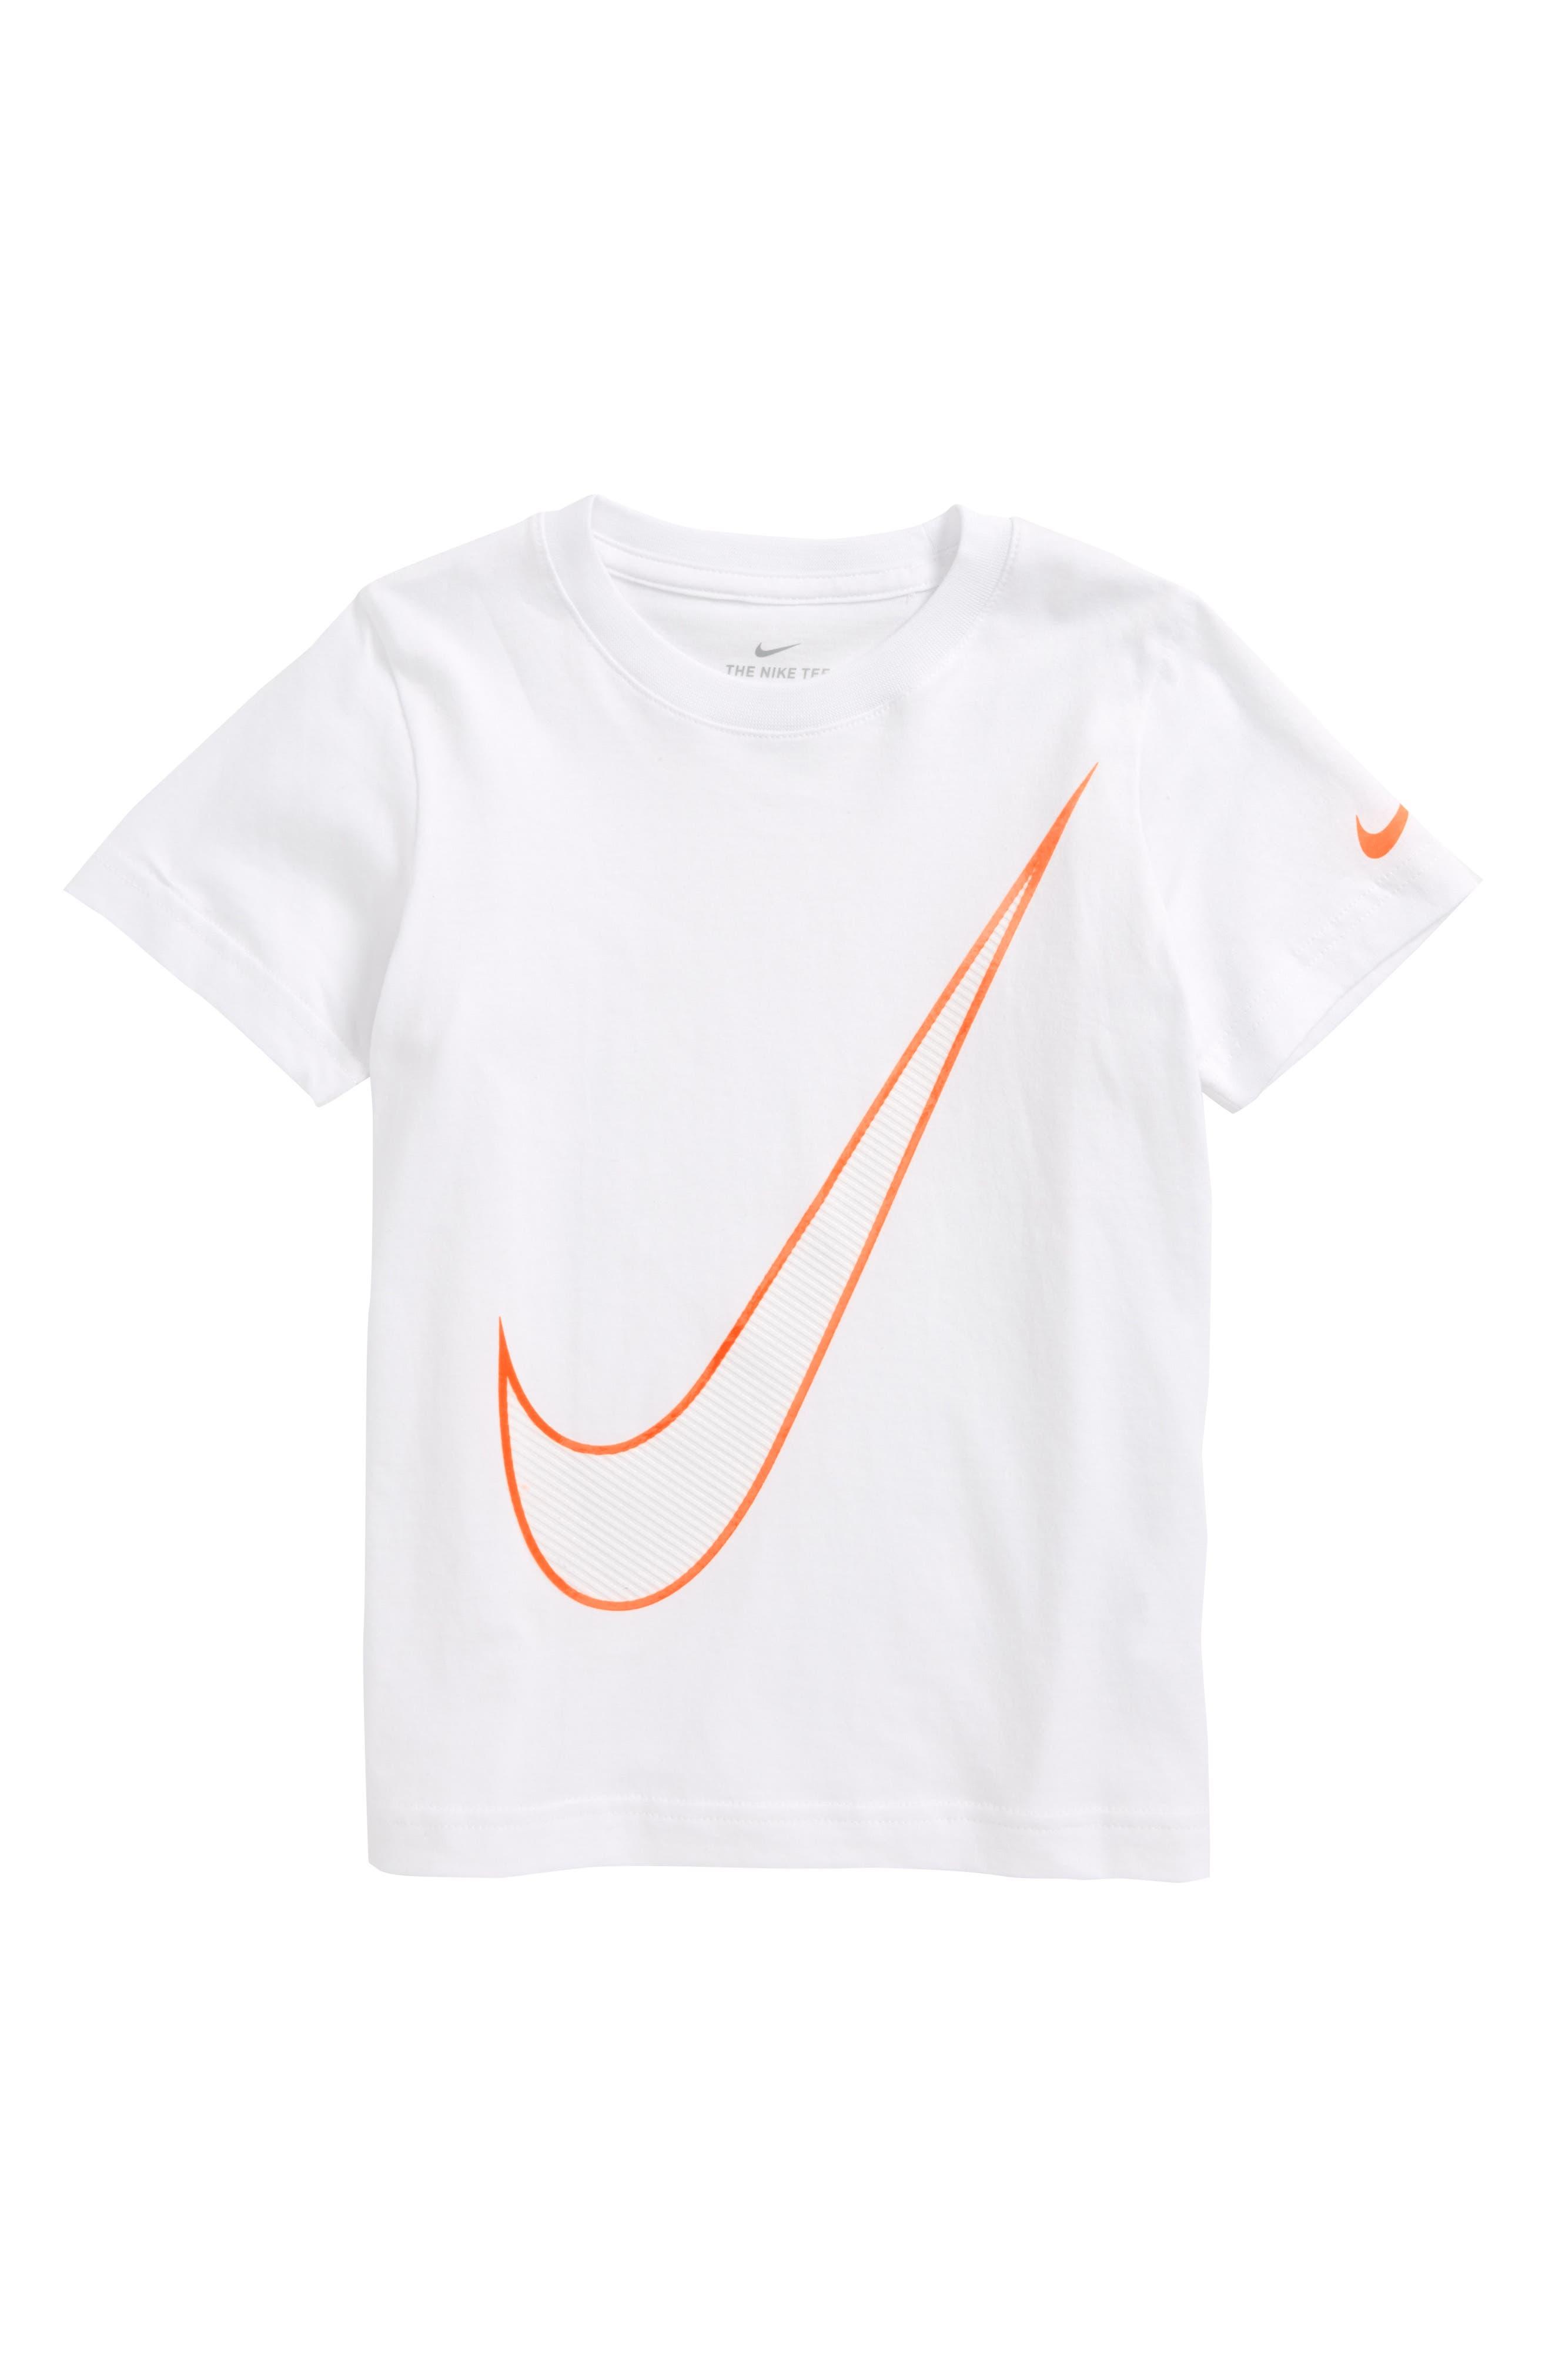 Main Image - Nike Oversize Swoosh Graphic T-Shirt (Toddler Boys & Little Boys)